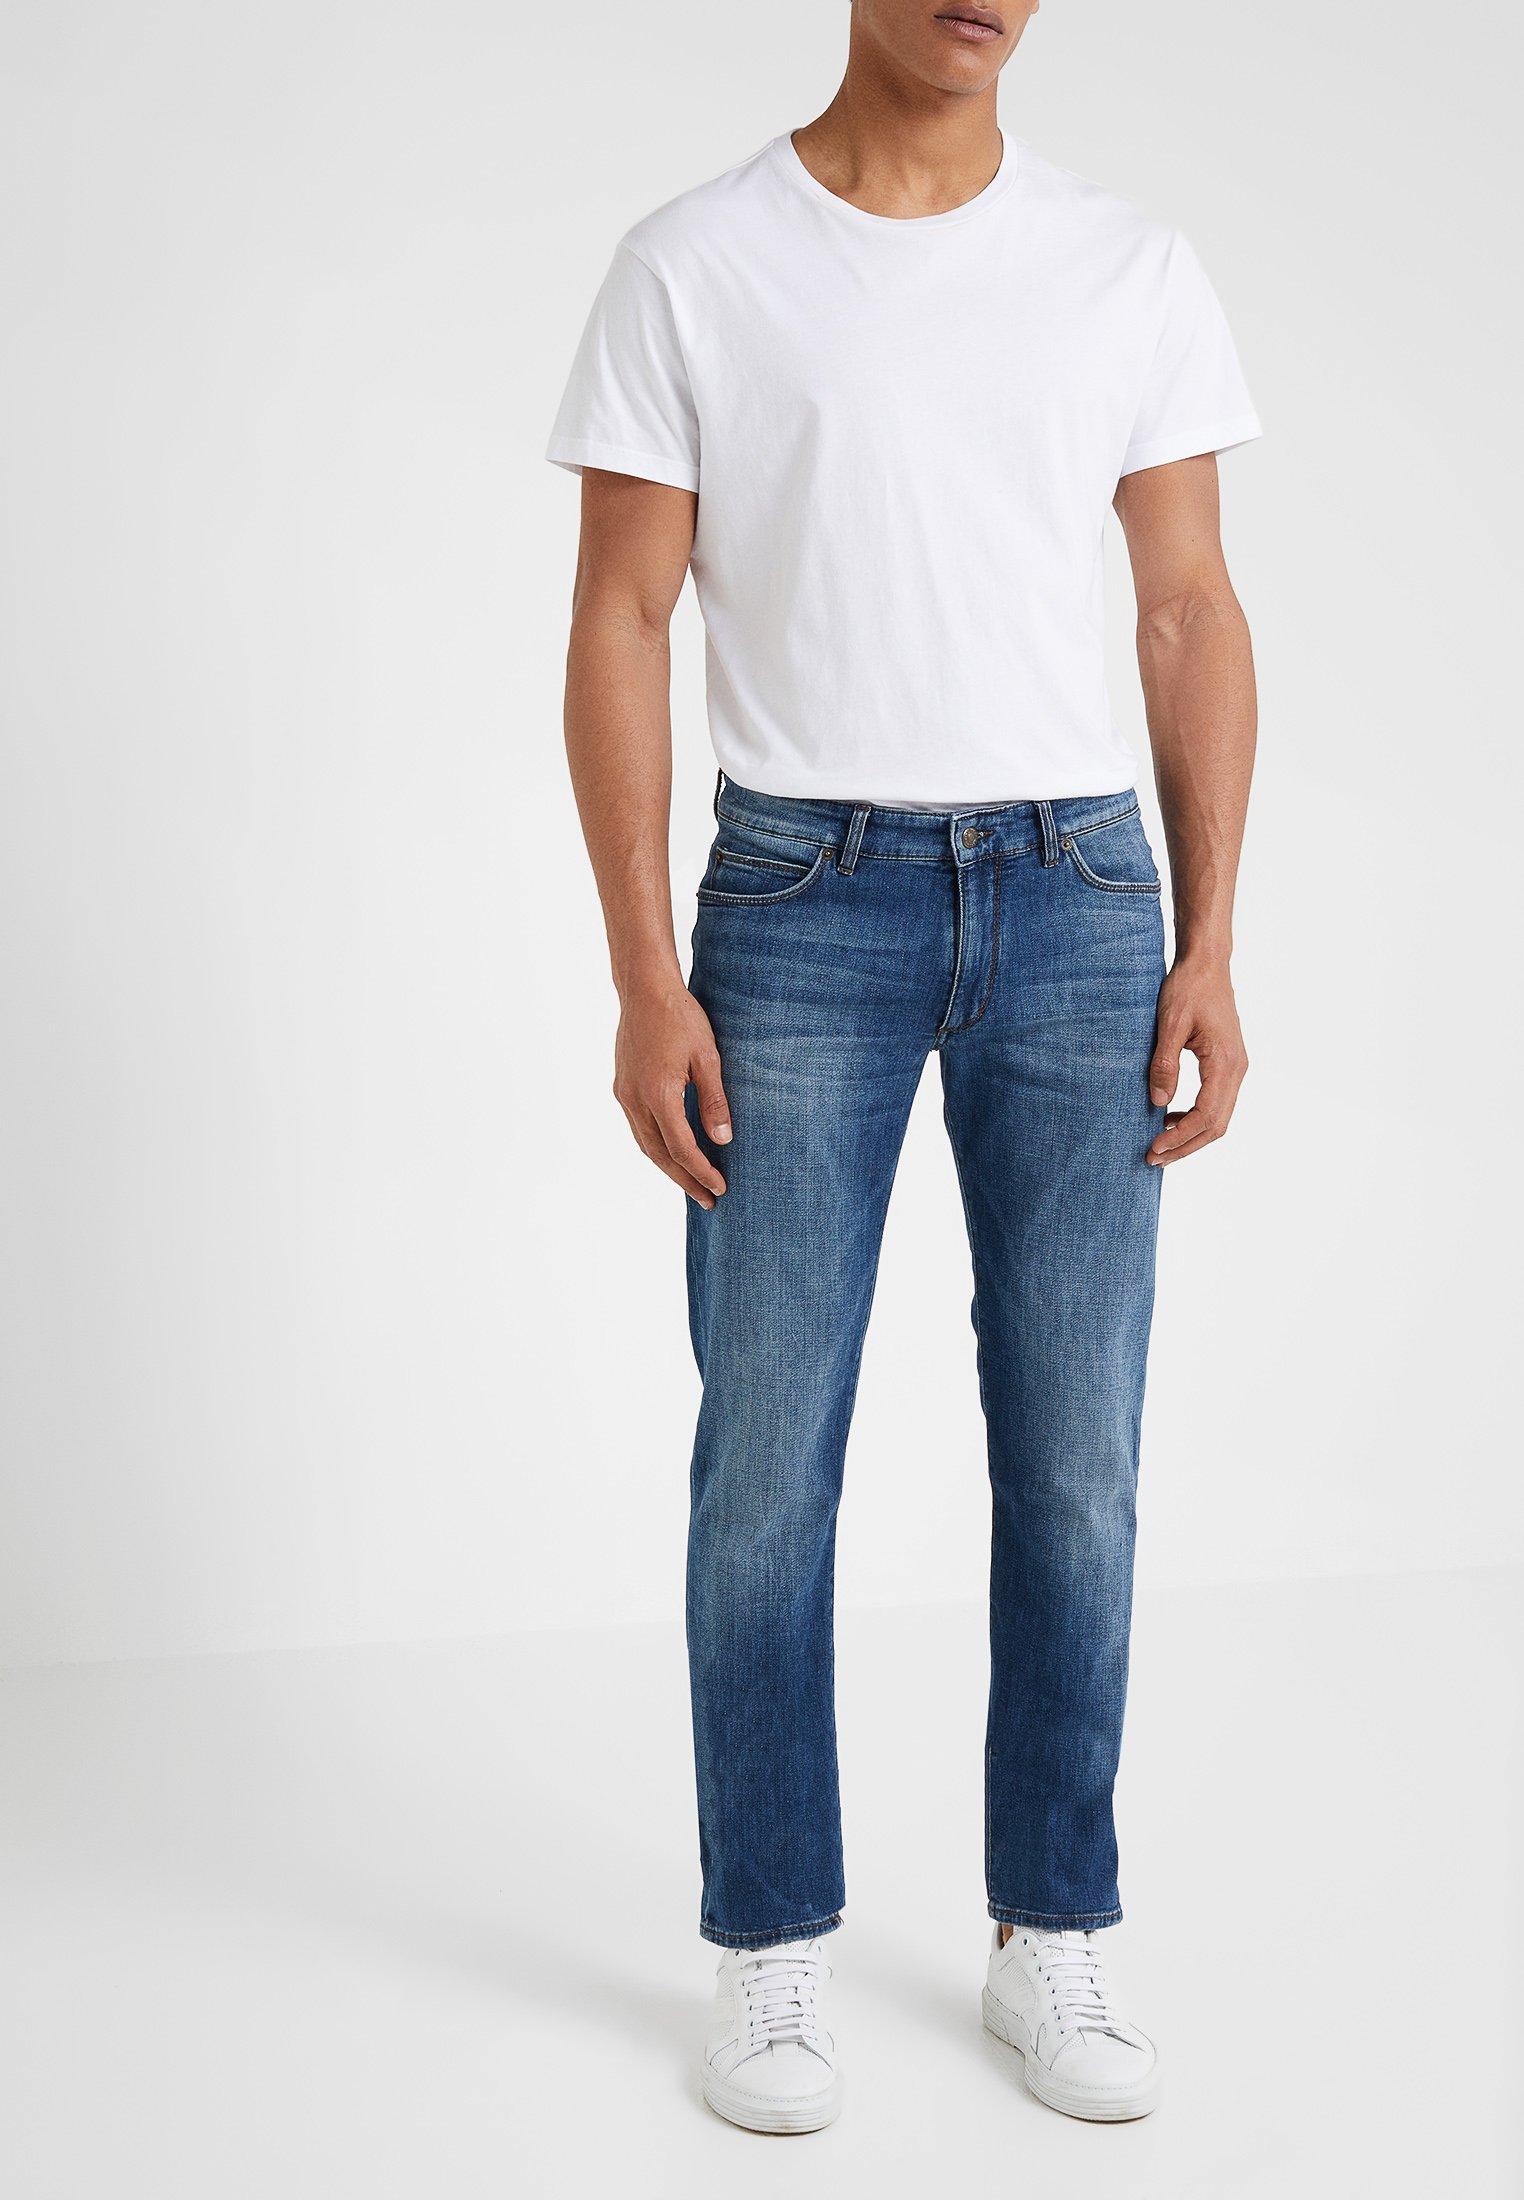 Drykorn Jaw - Jeans Slim Fit Blue Denim FEQrOQP